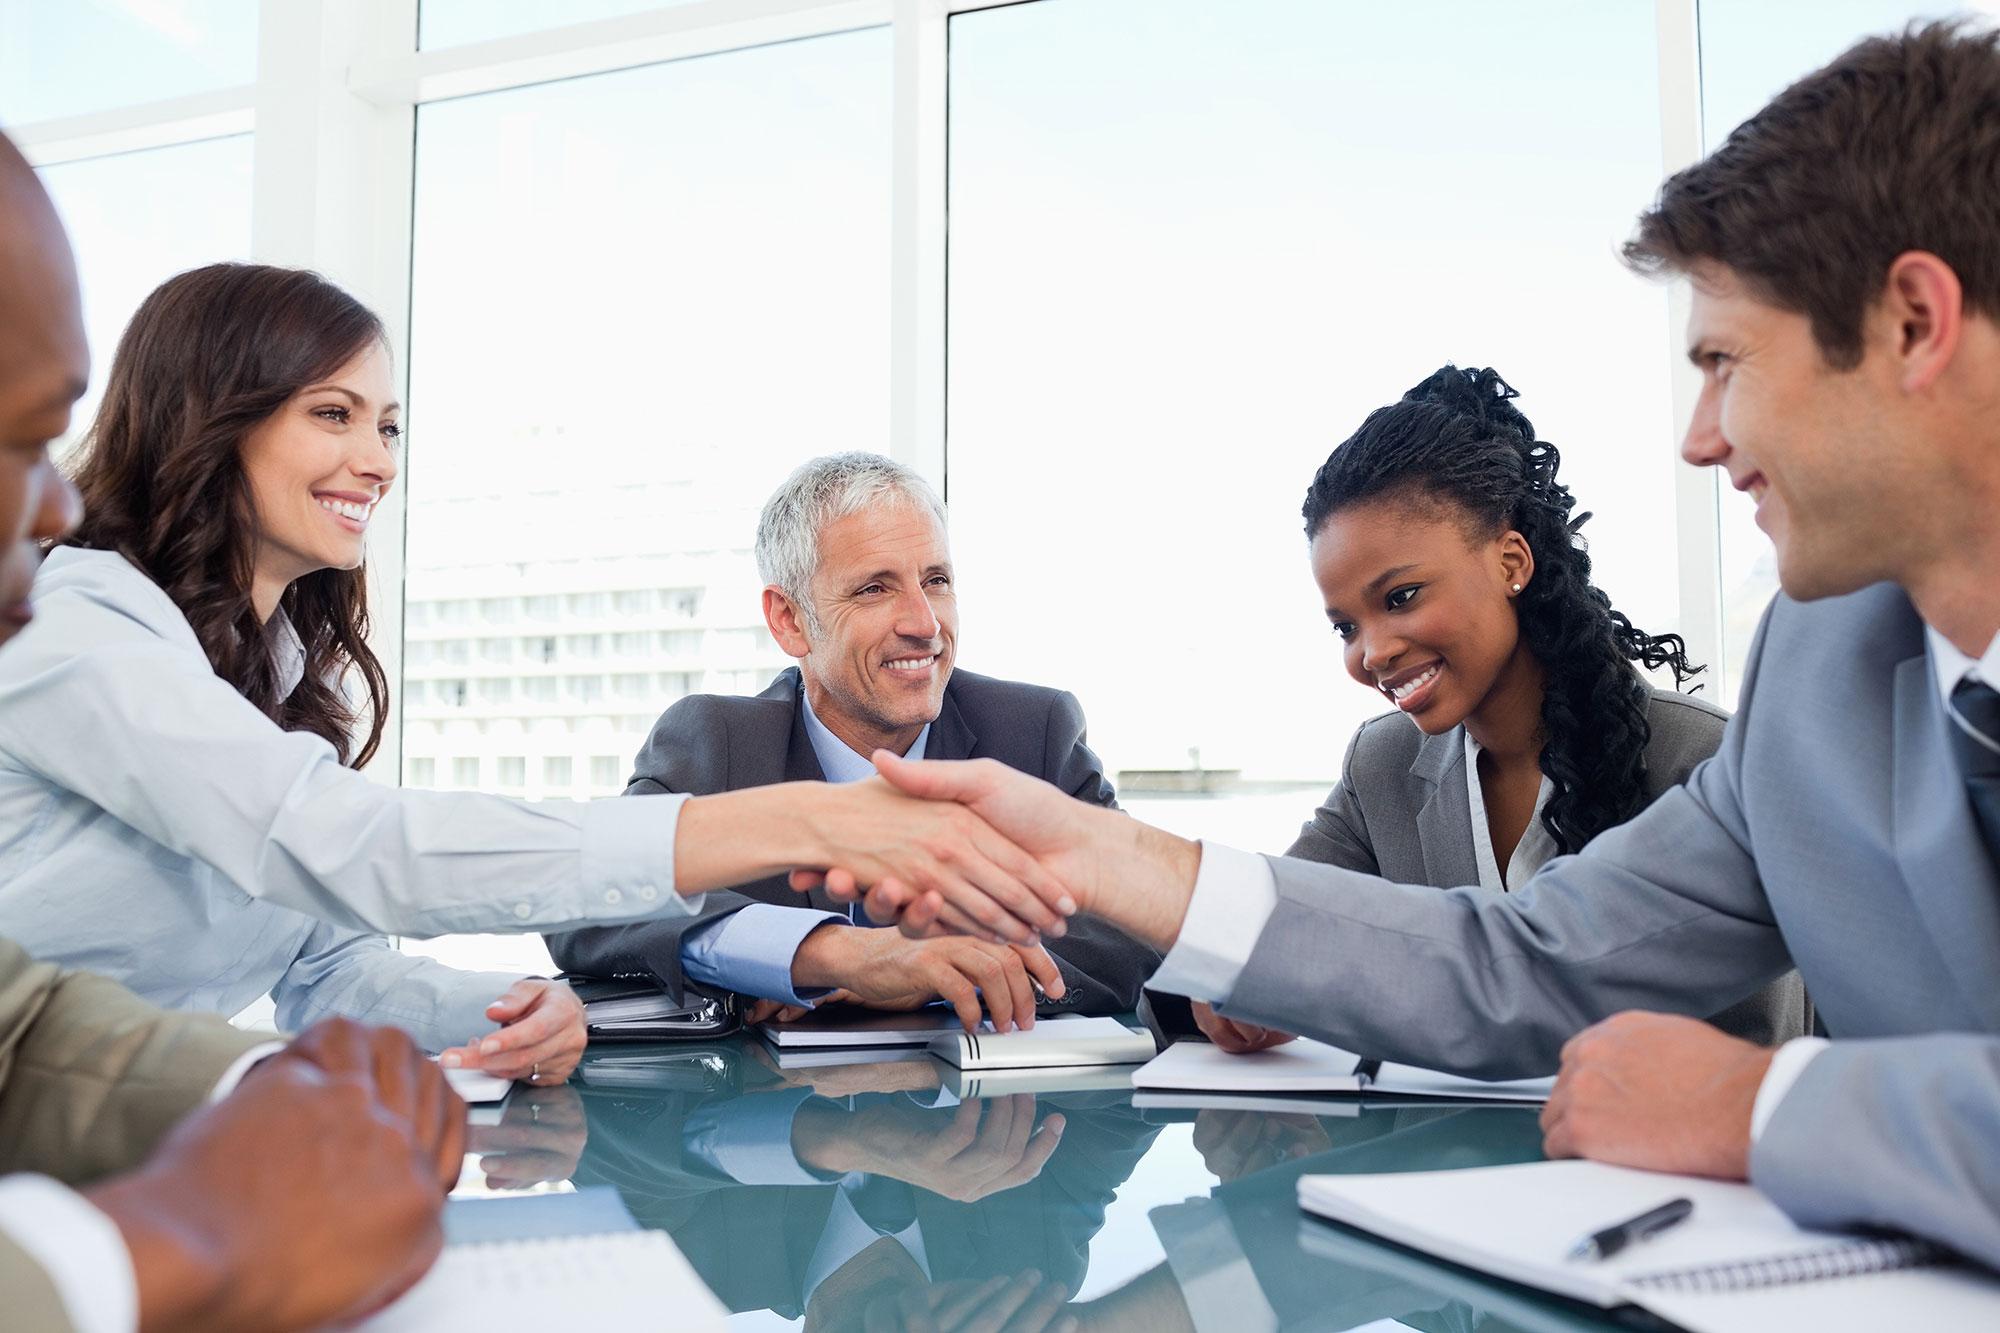 mediazione legal professional netowrk istanza di mediazione obbligatoria procedura di mediazione adr occ svoraindebitamento crisi